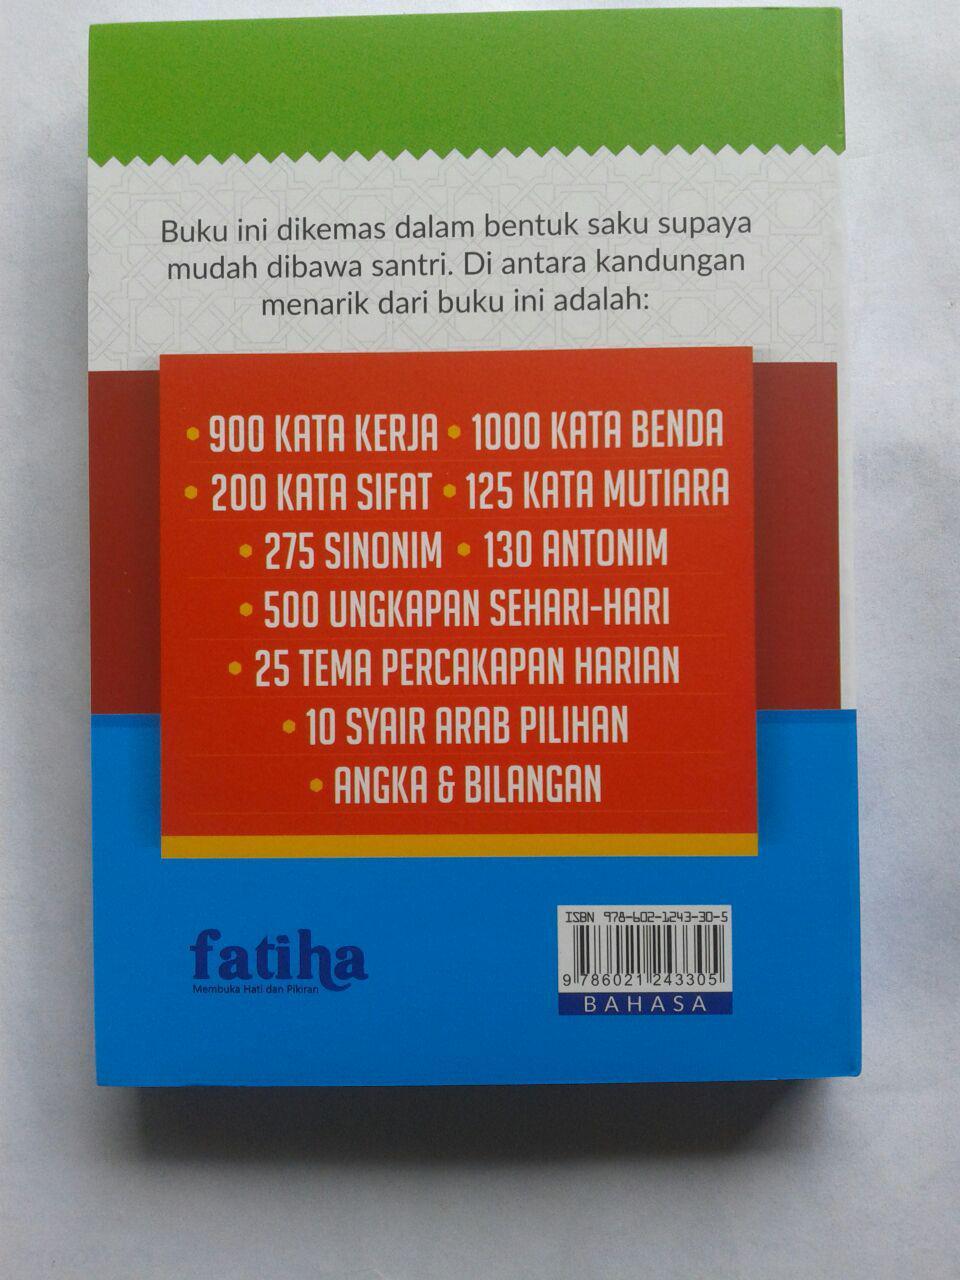 Buku Saku Kamus Santri Hebat Cepat Menguasai Bahasa Arab cover 2